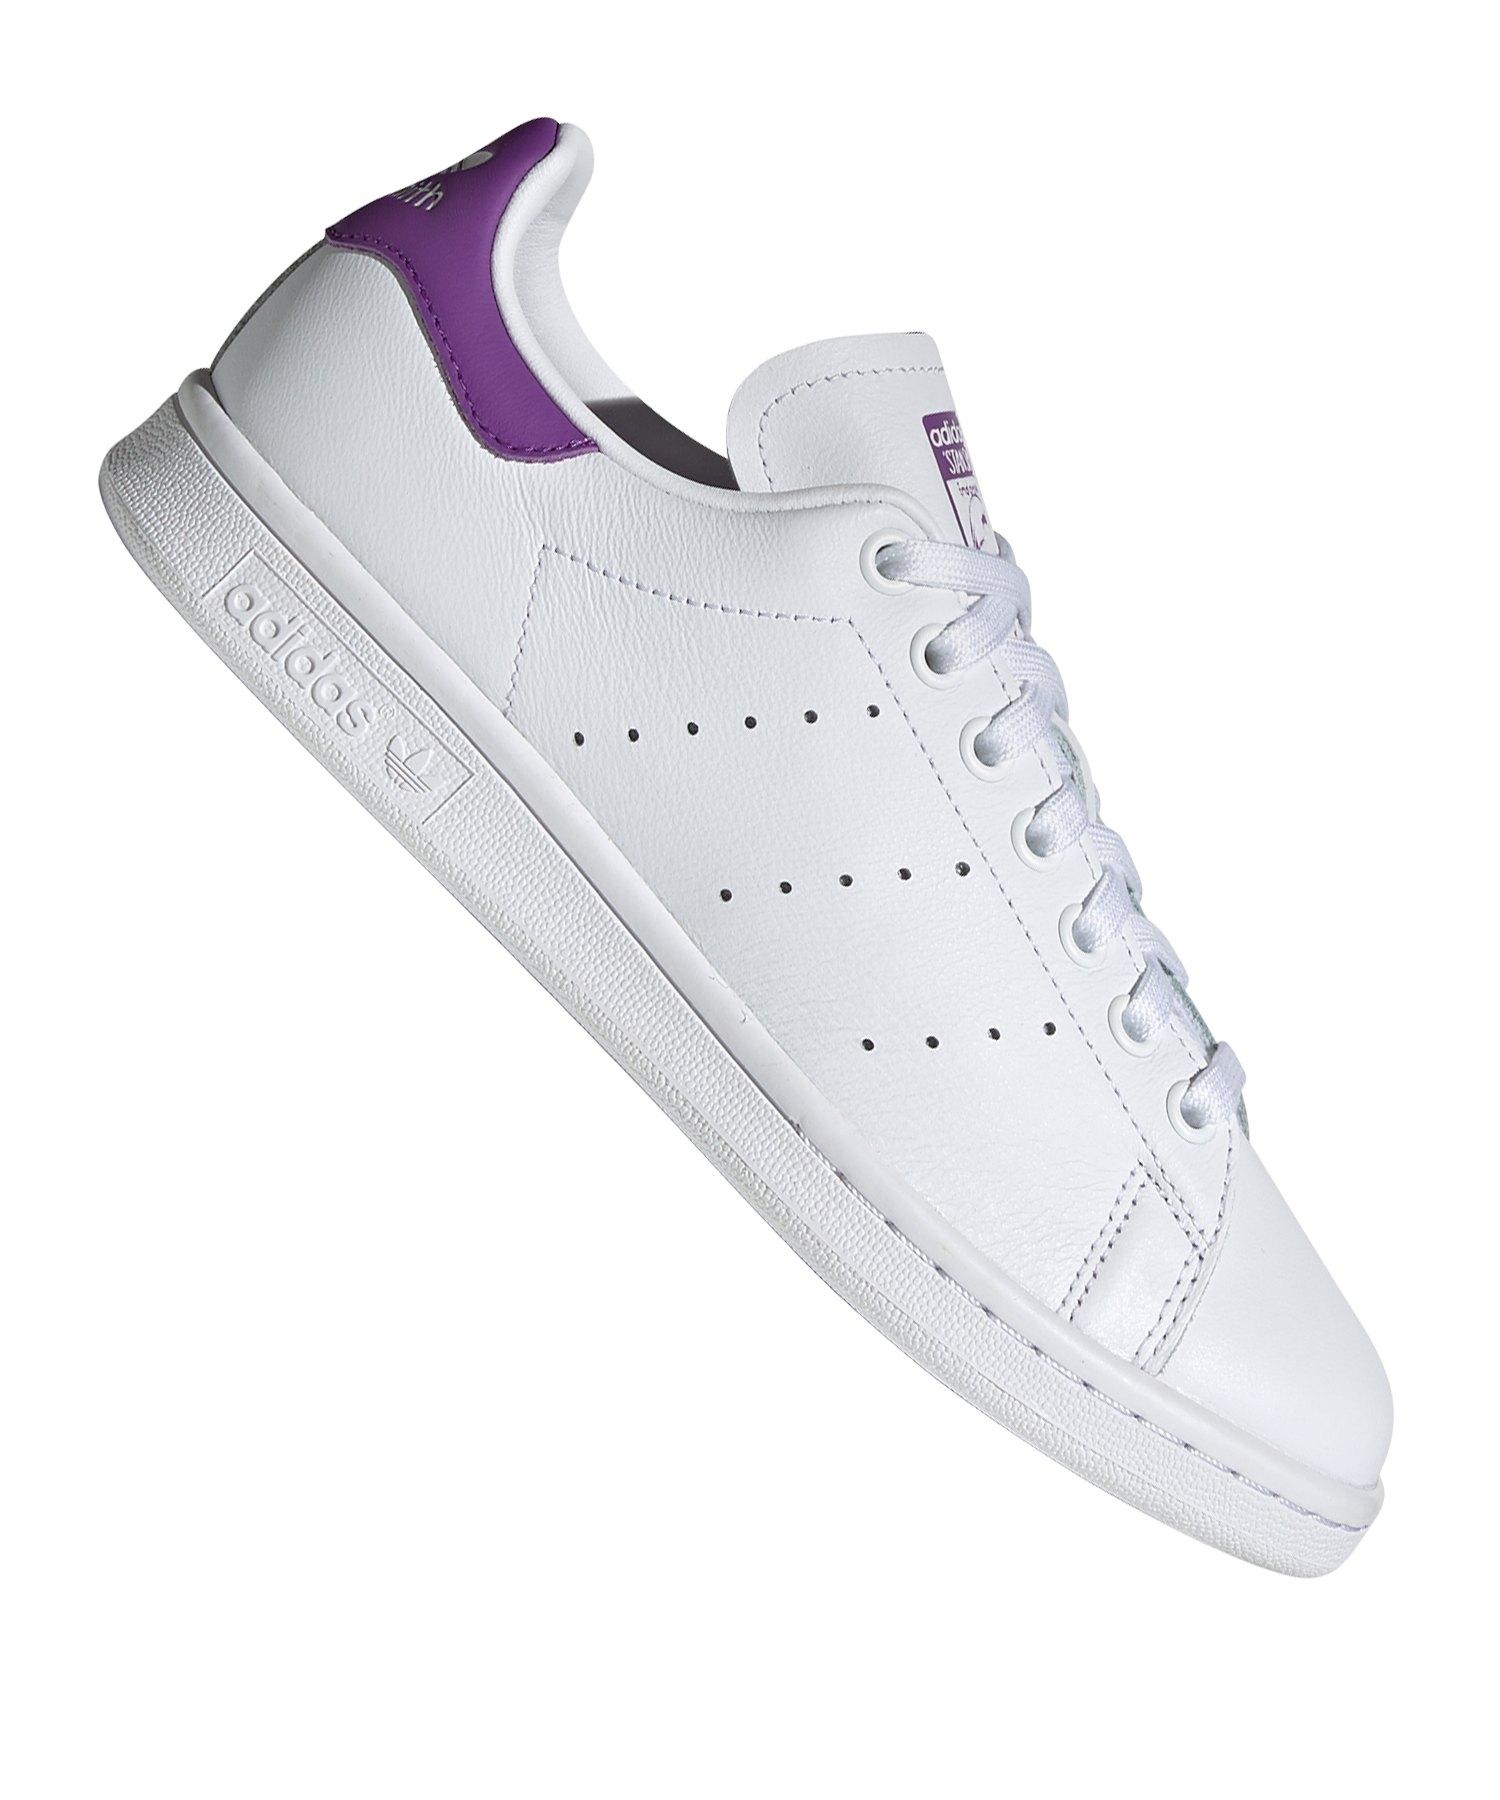 : Adidas Stan Smith Damen Adidas